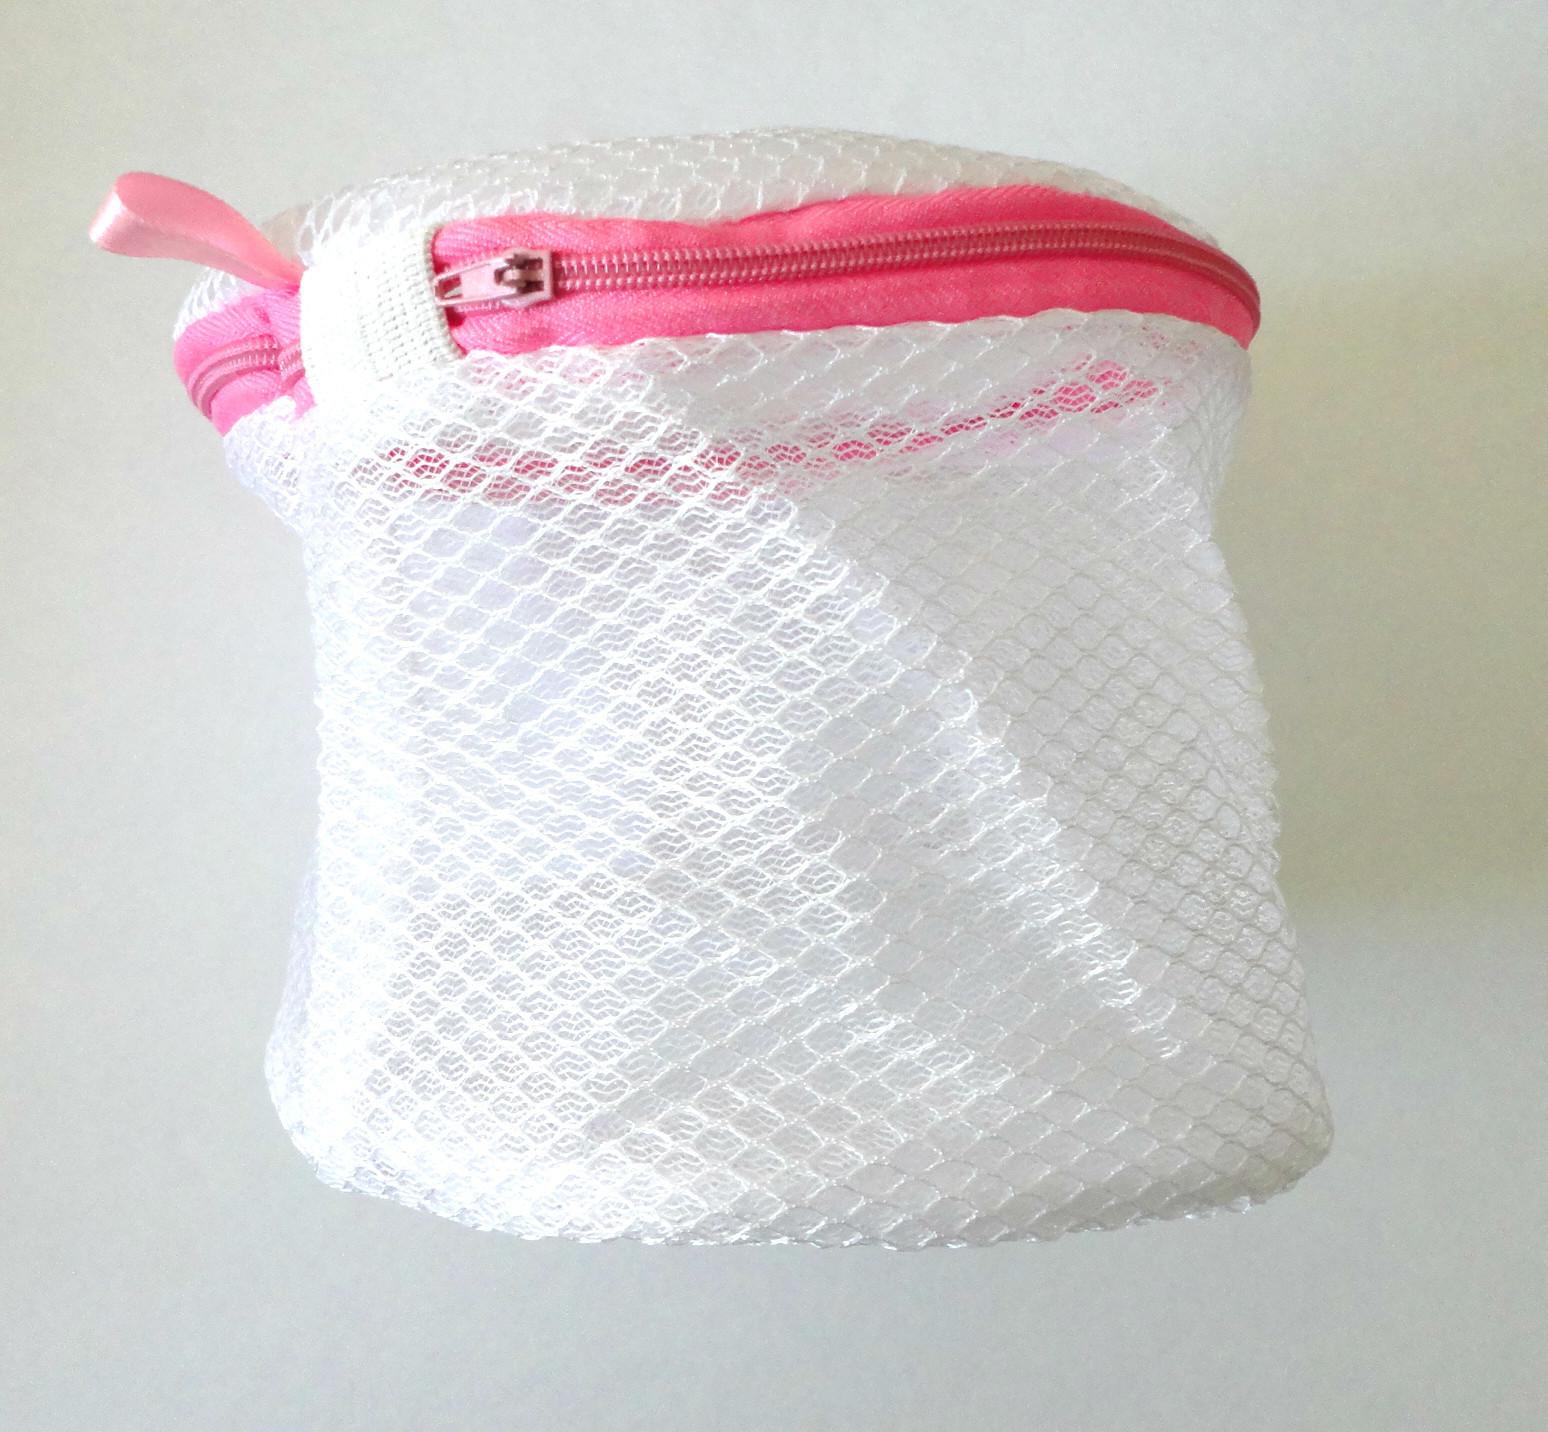 Washers Nylon Bags Nylon 119